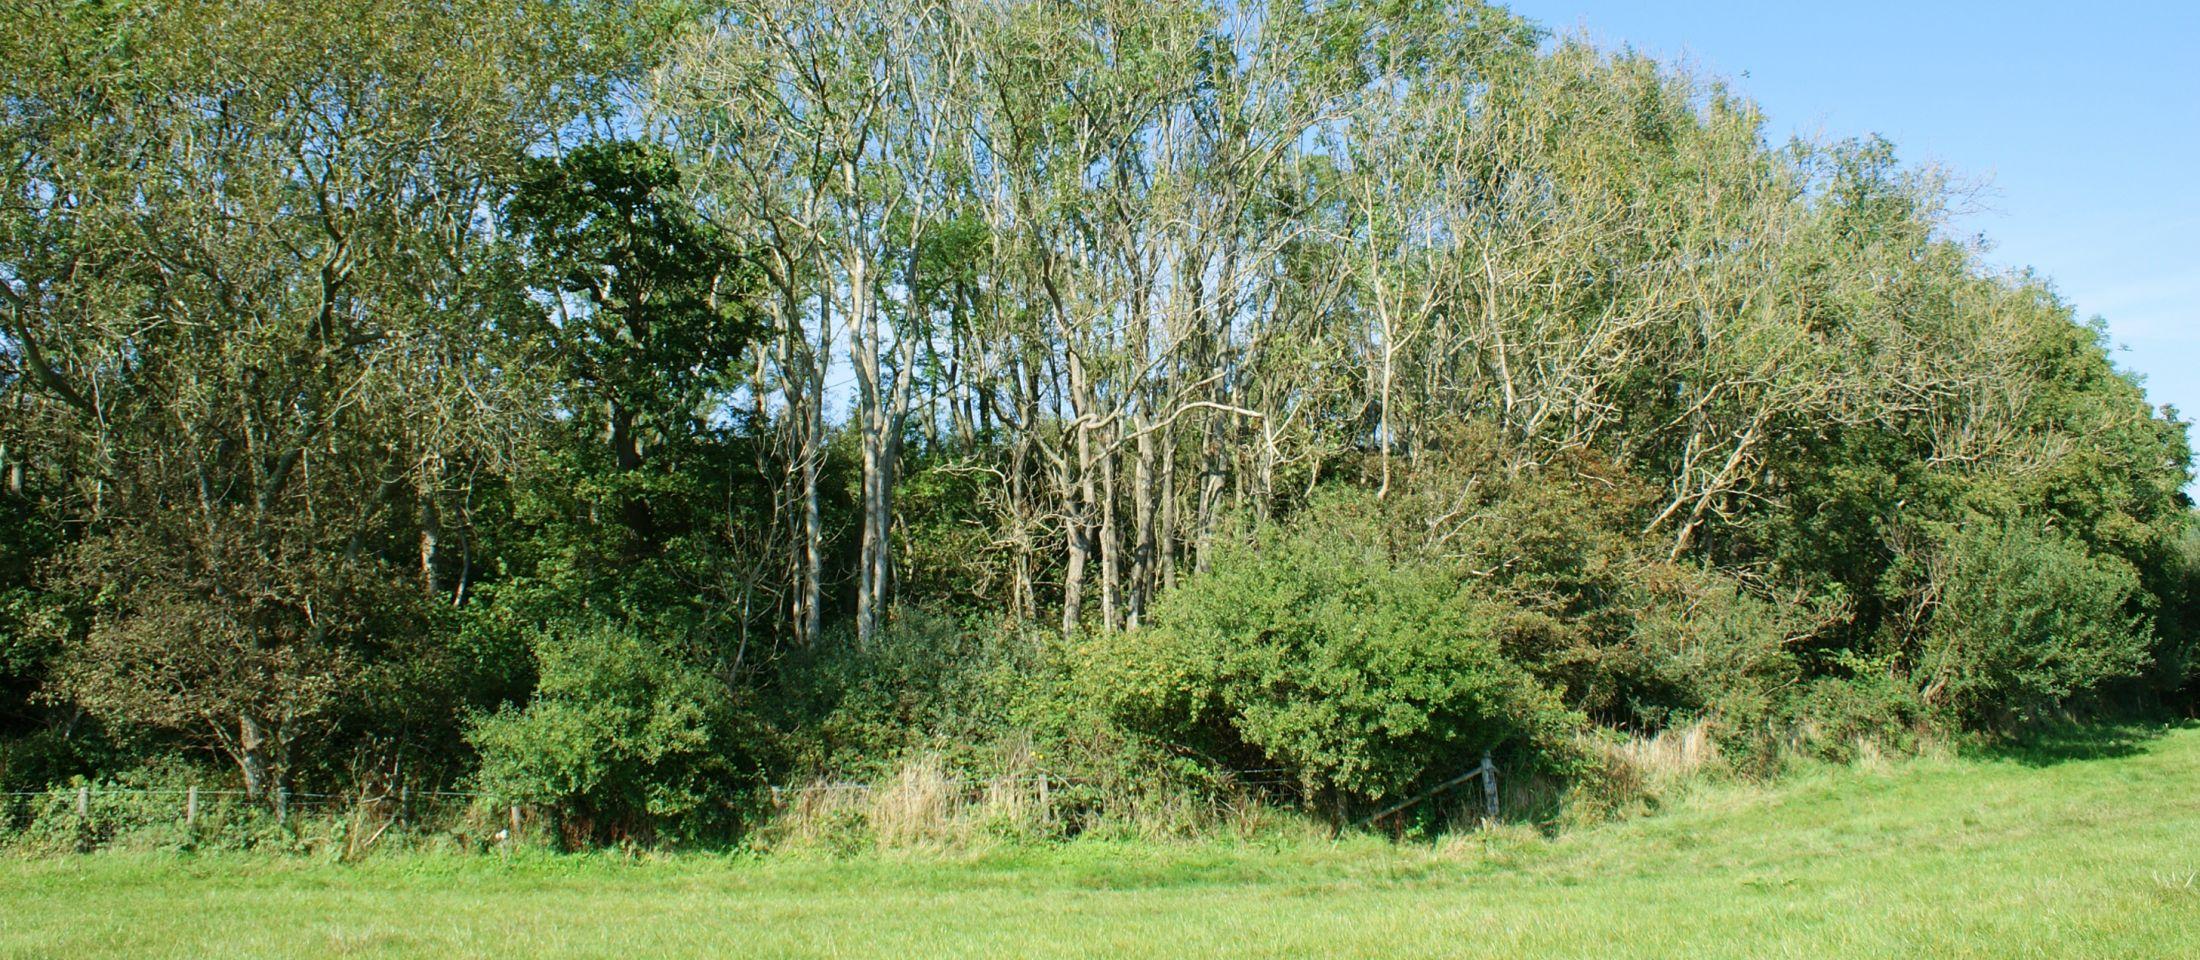 Ash trees in Asholt Wood, Sept 2014.